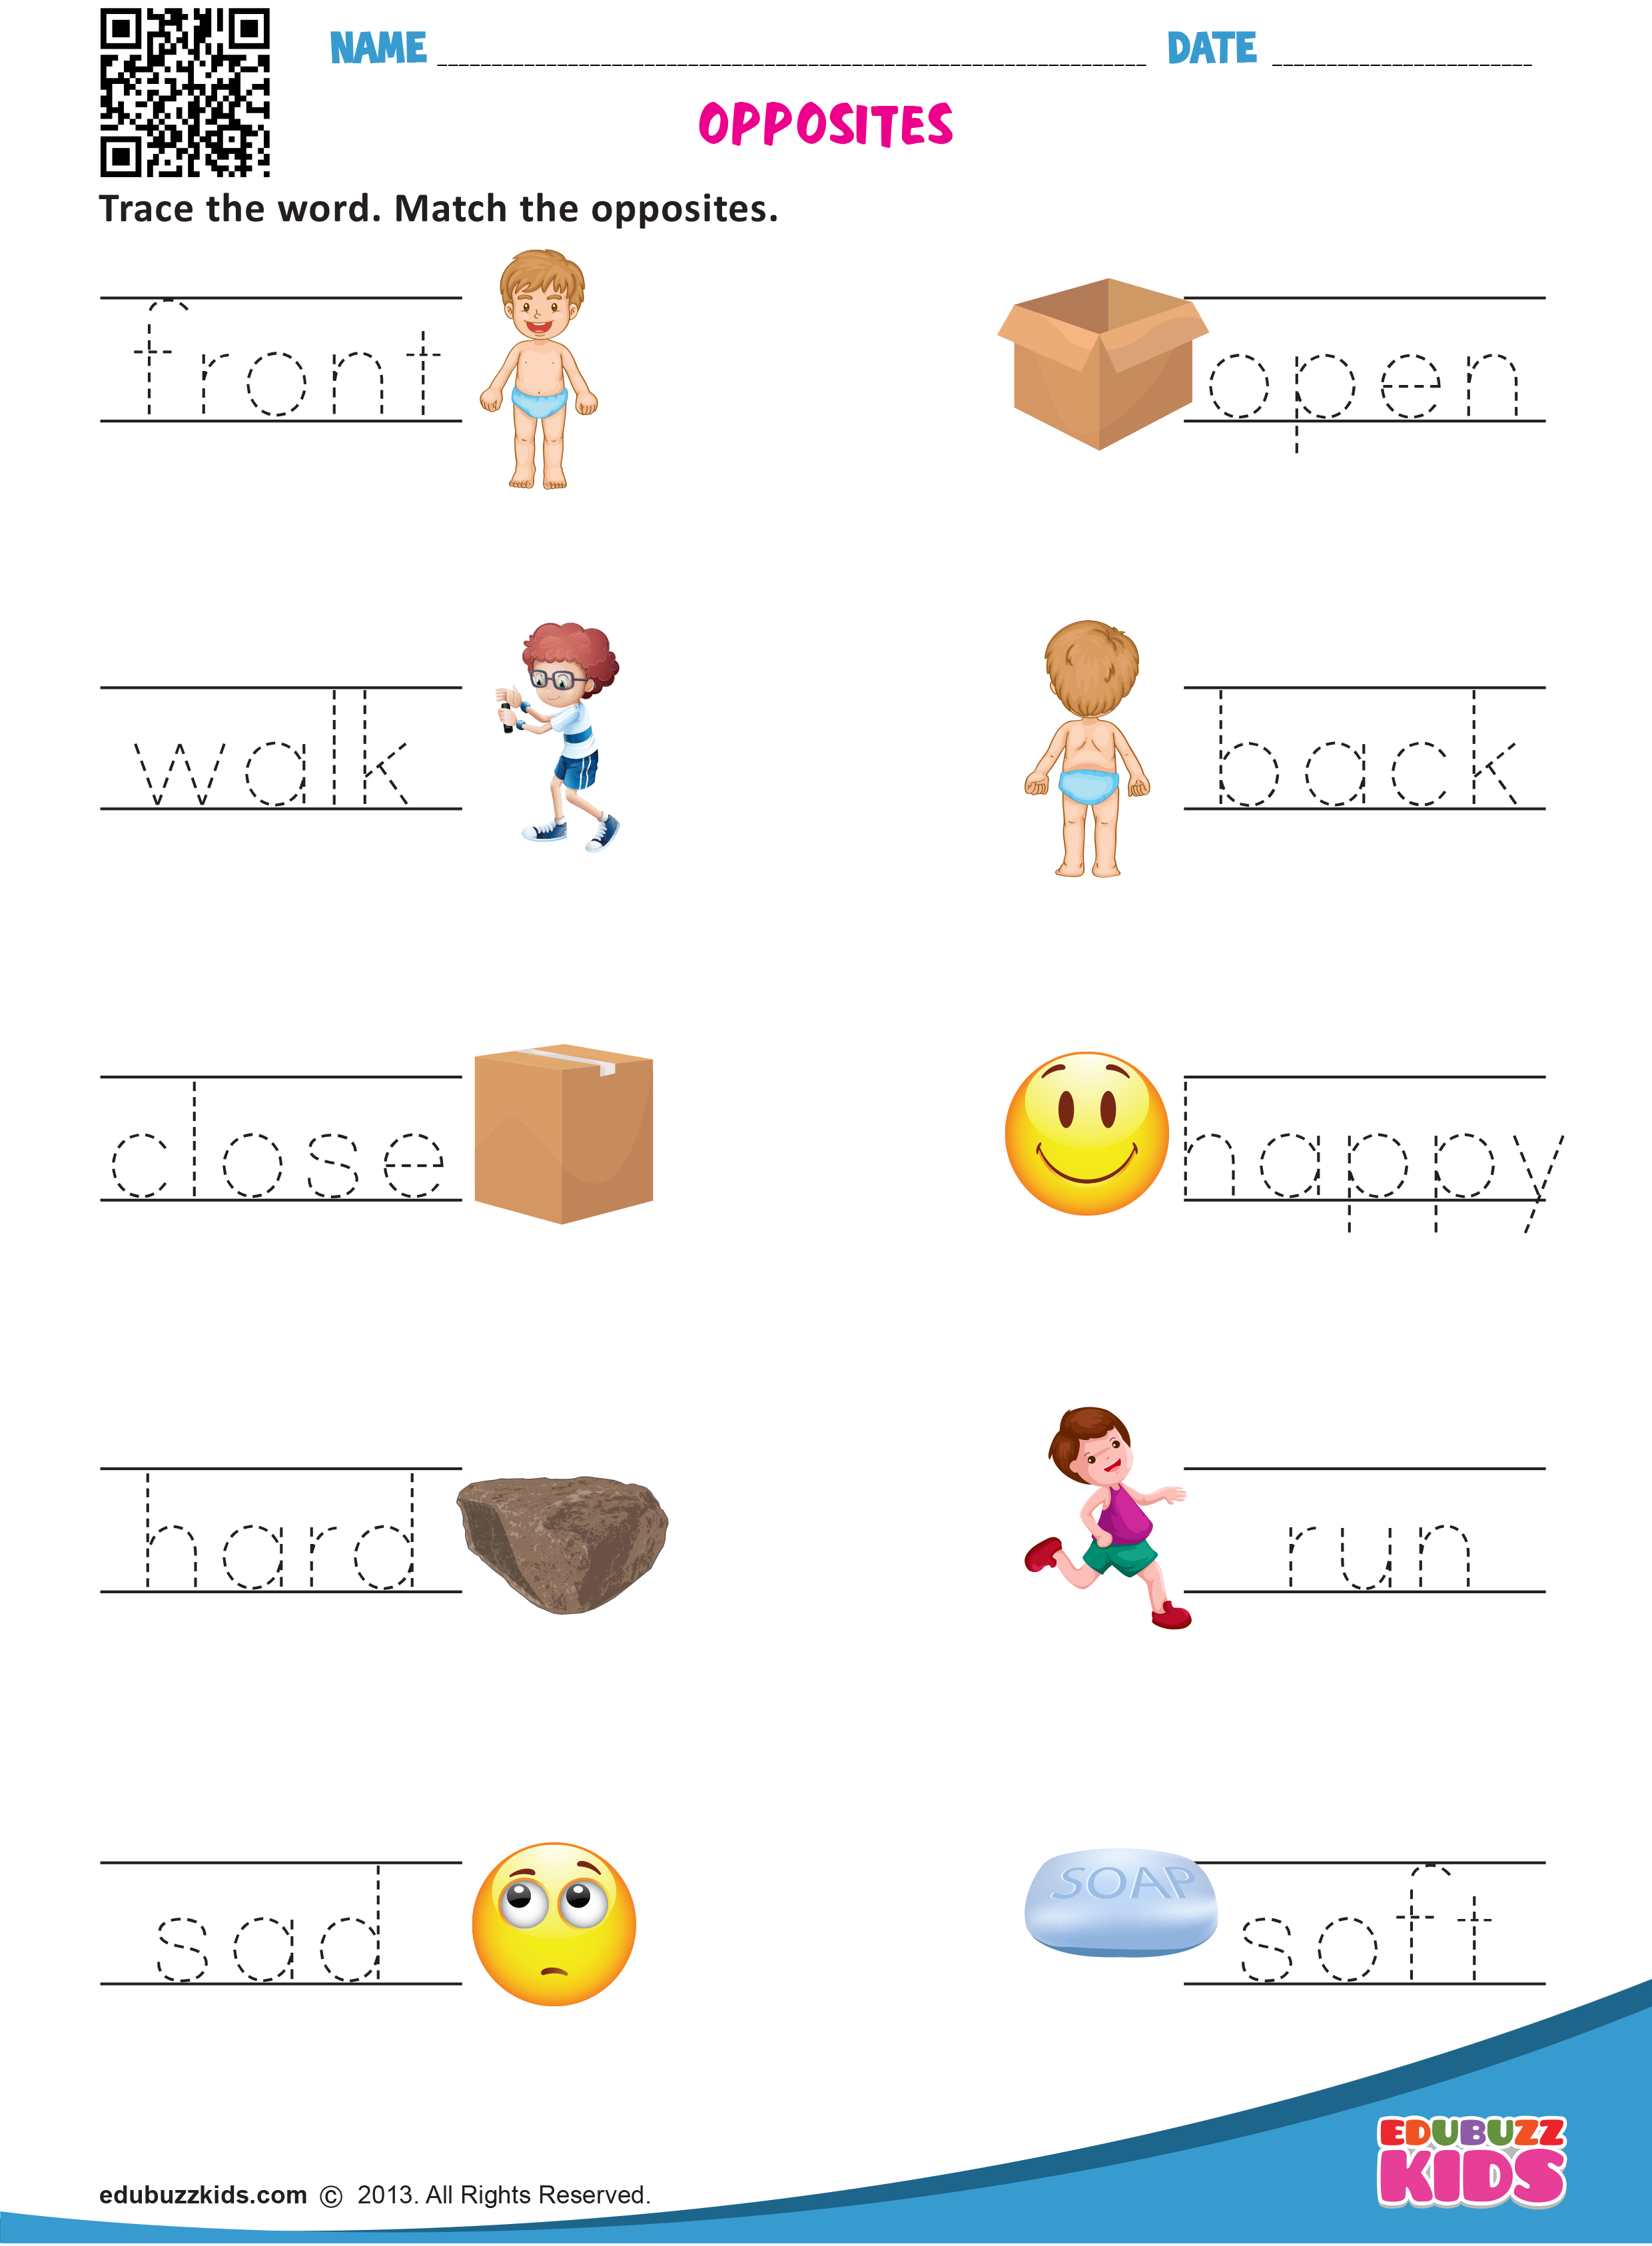 Printable English Opposite Words Worksheets For Preschool